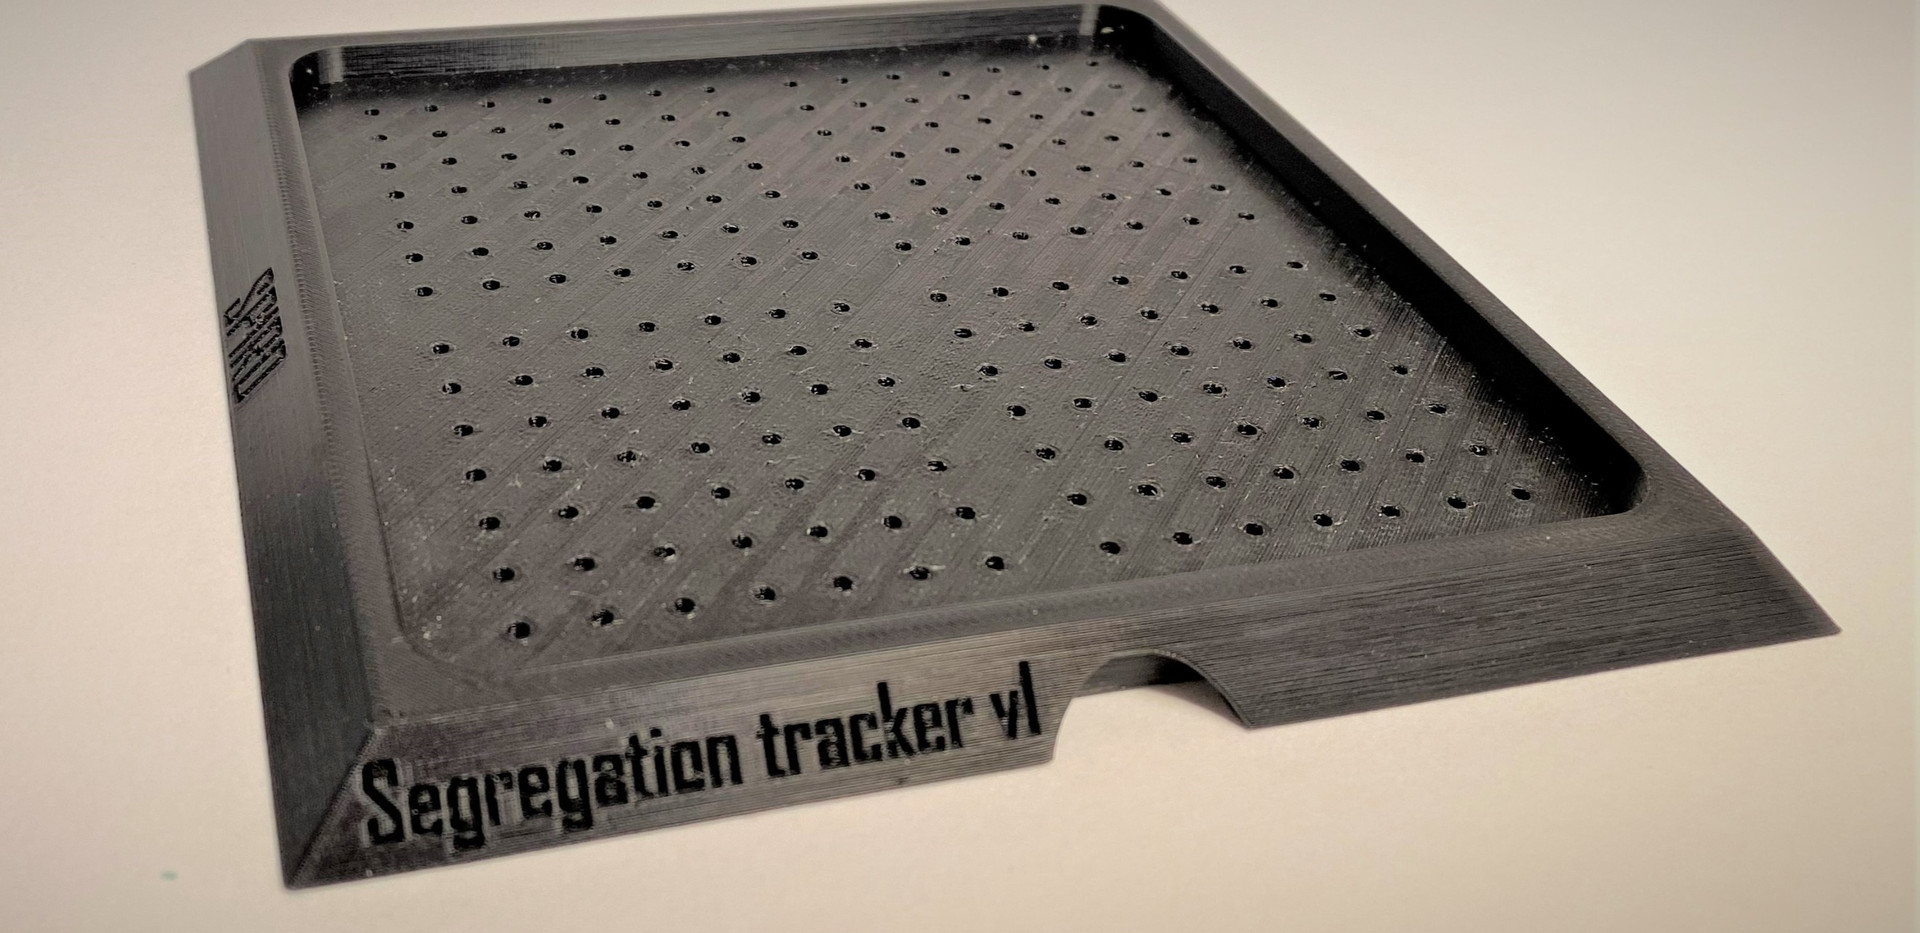 Segregation tracker